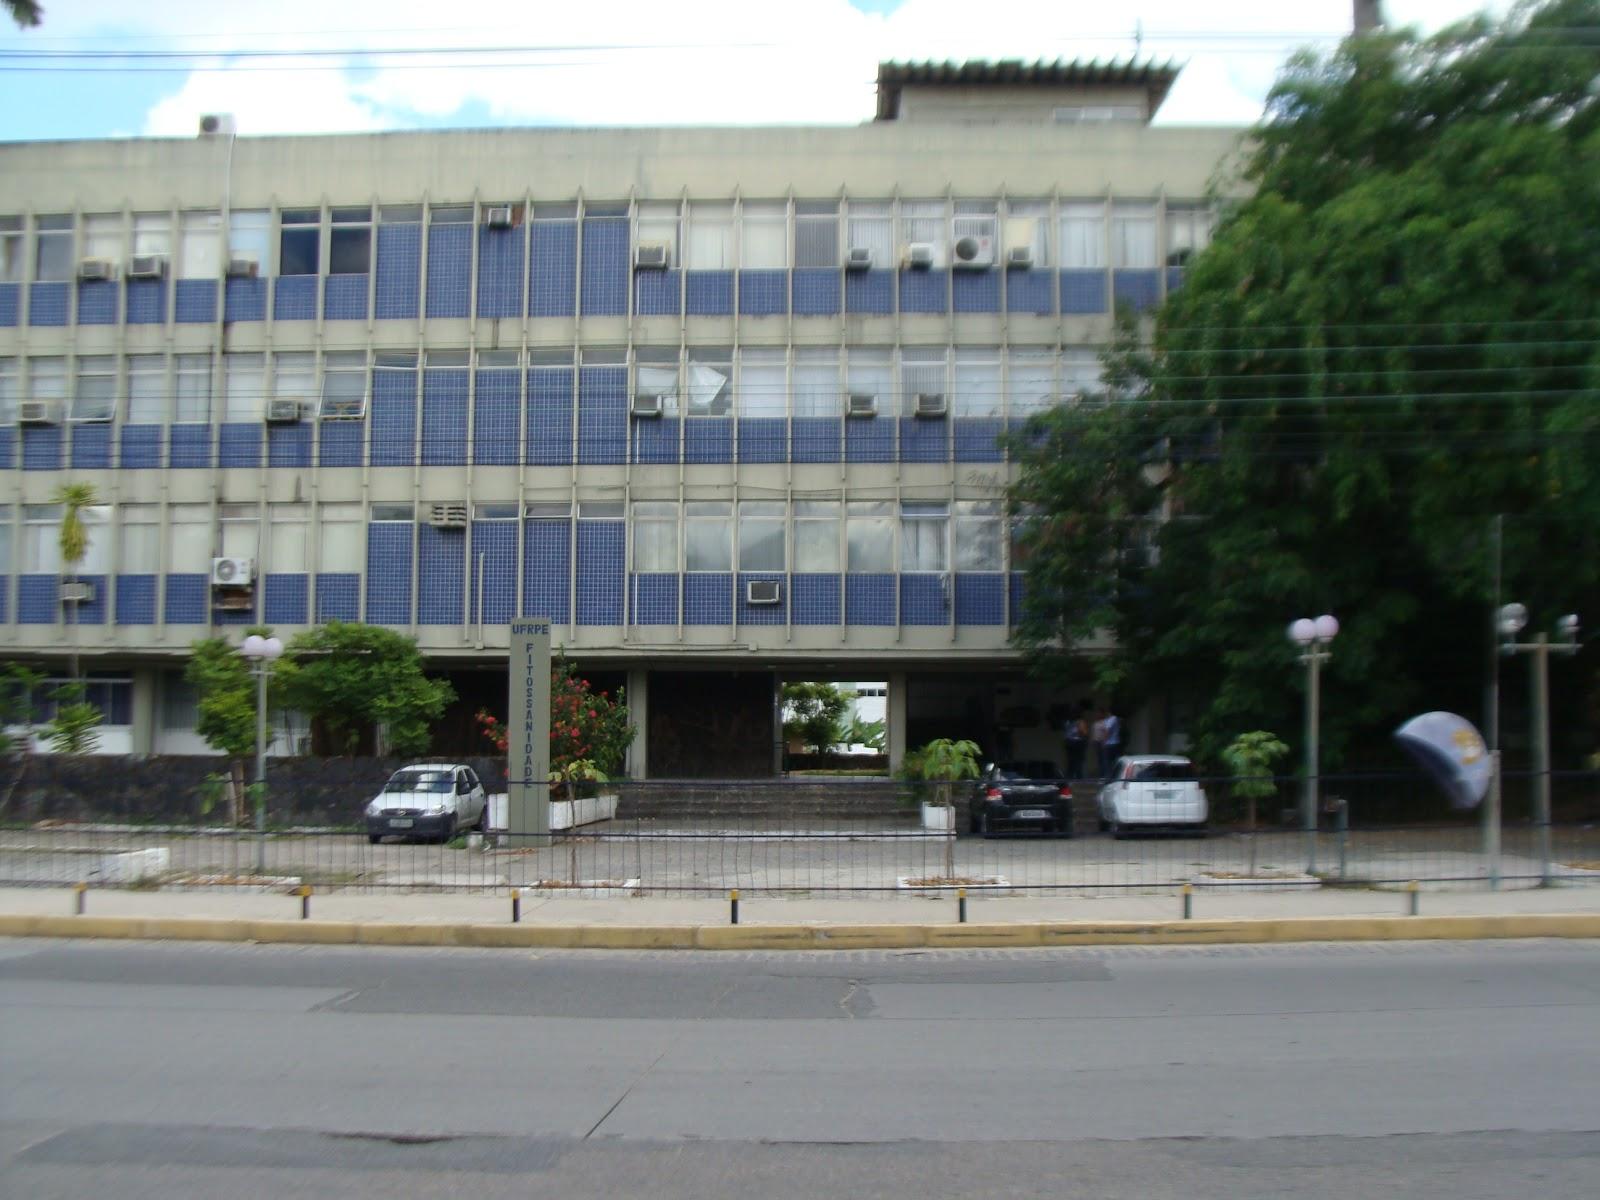 Mariana de moraes - 1 part 3